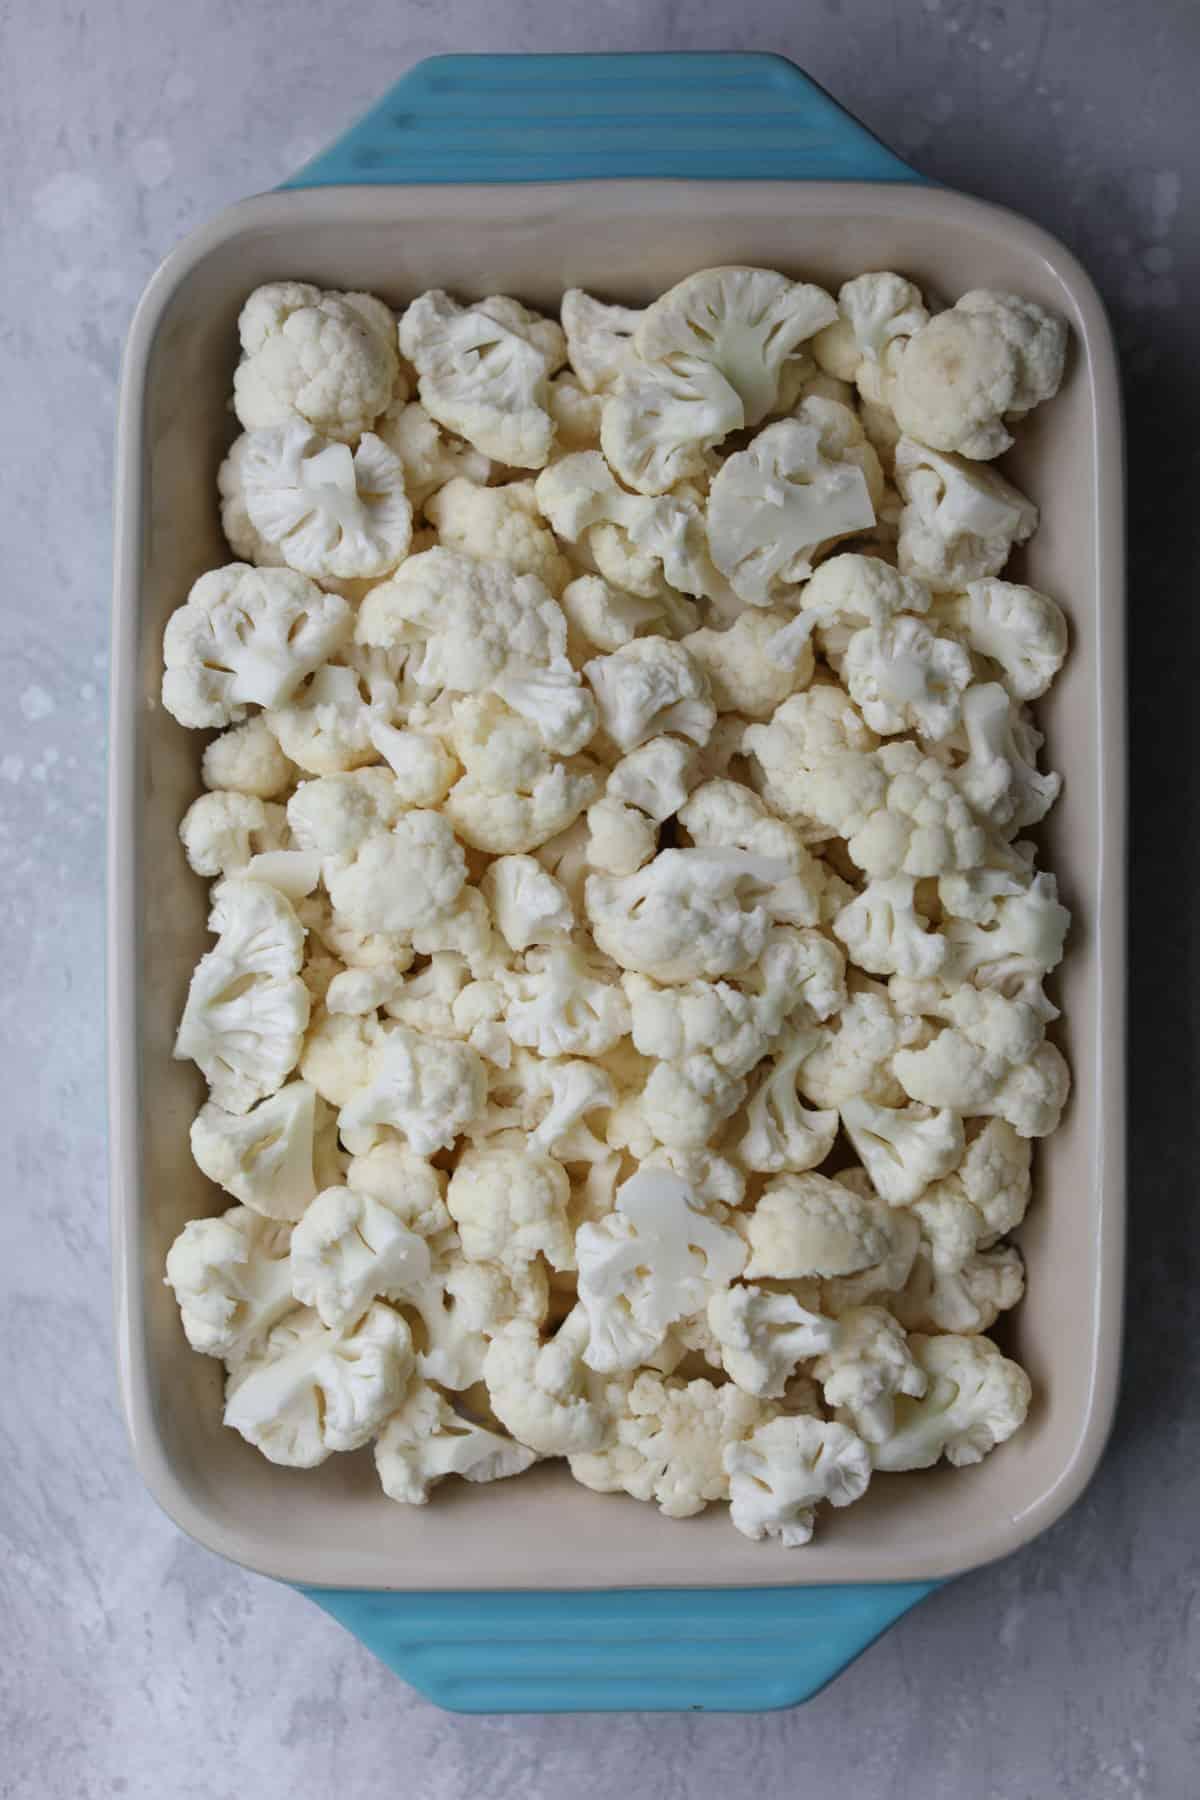 cauliflower in a baking dish